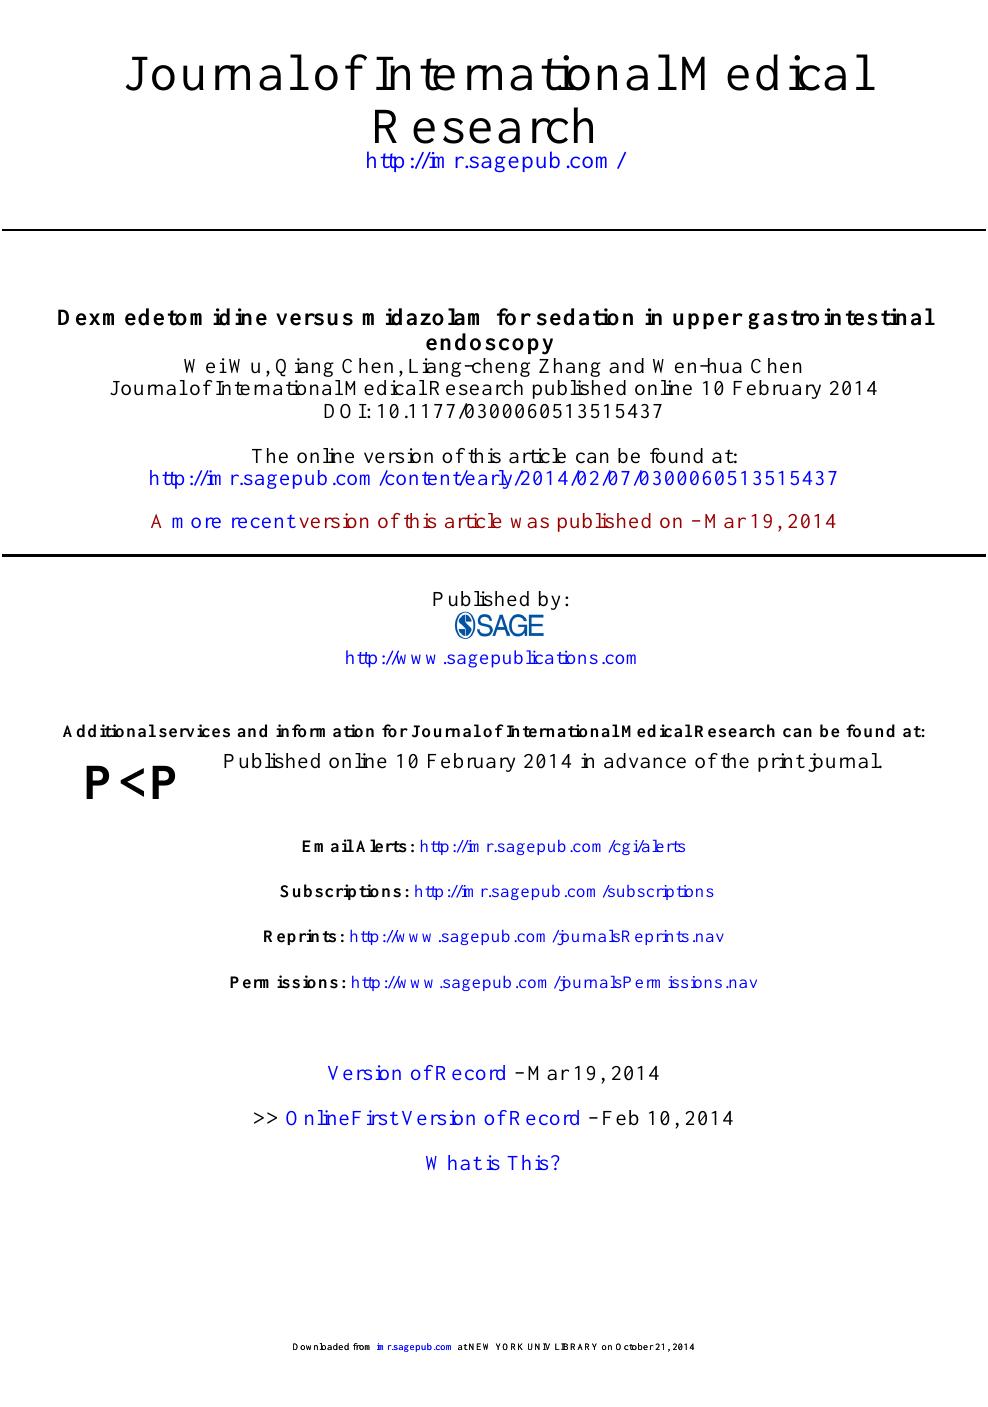 Dexmedetomidine versus midazolam for sedation in upper